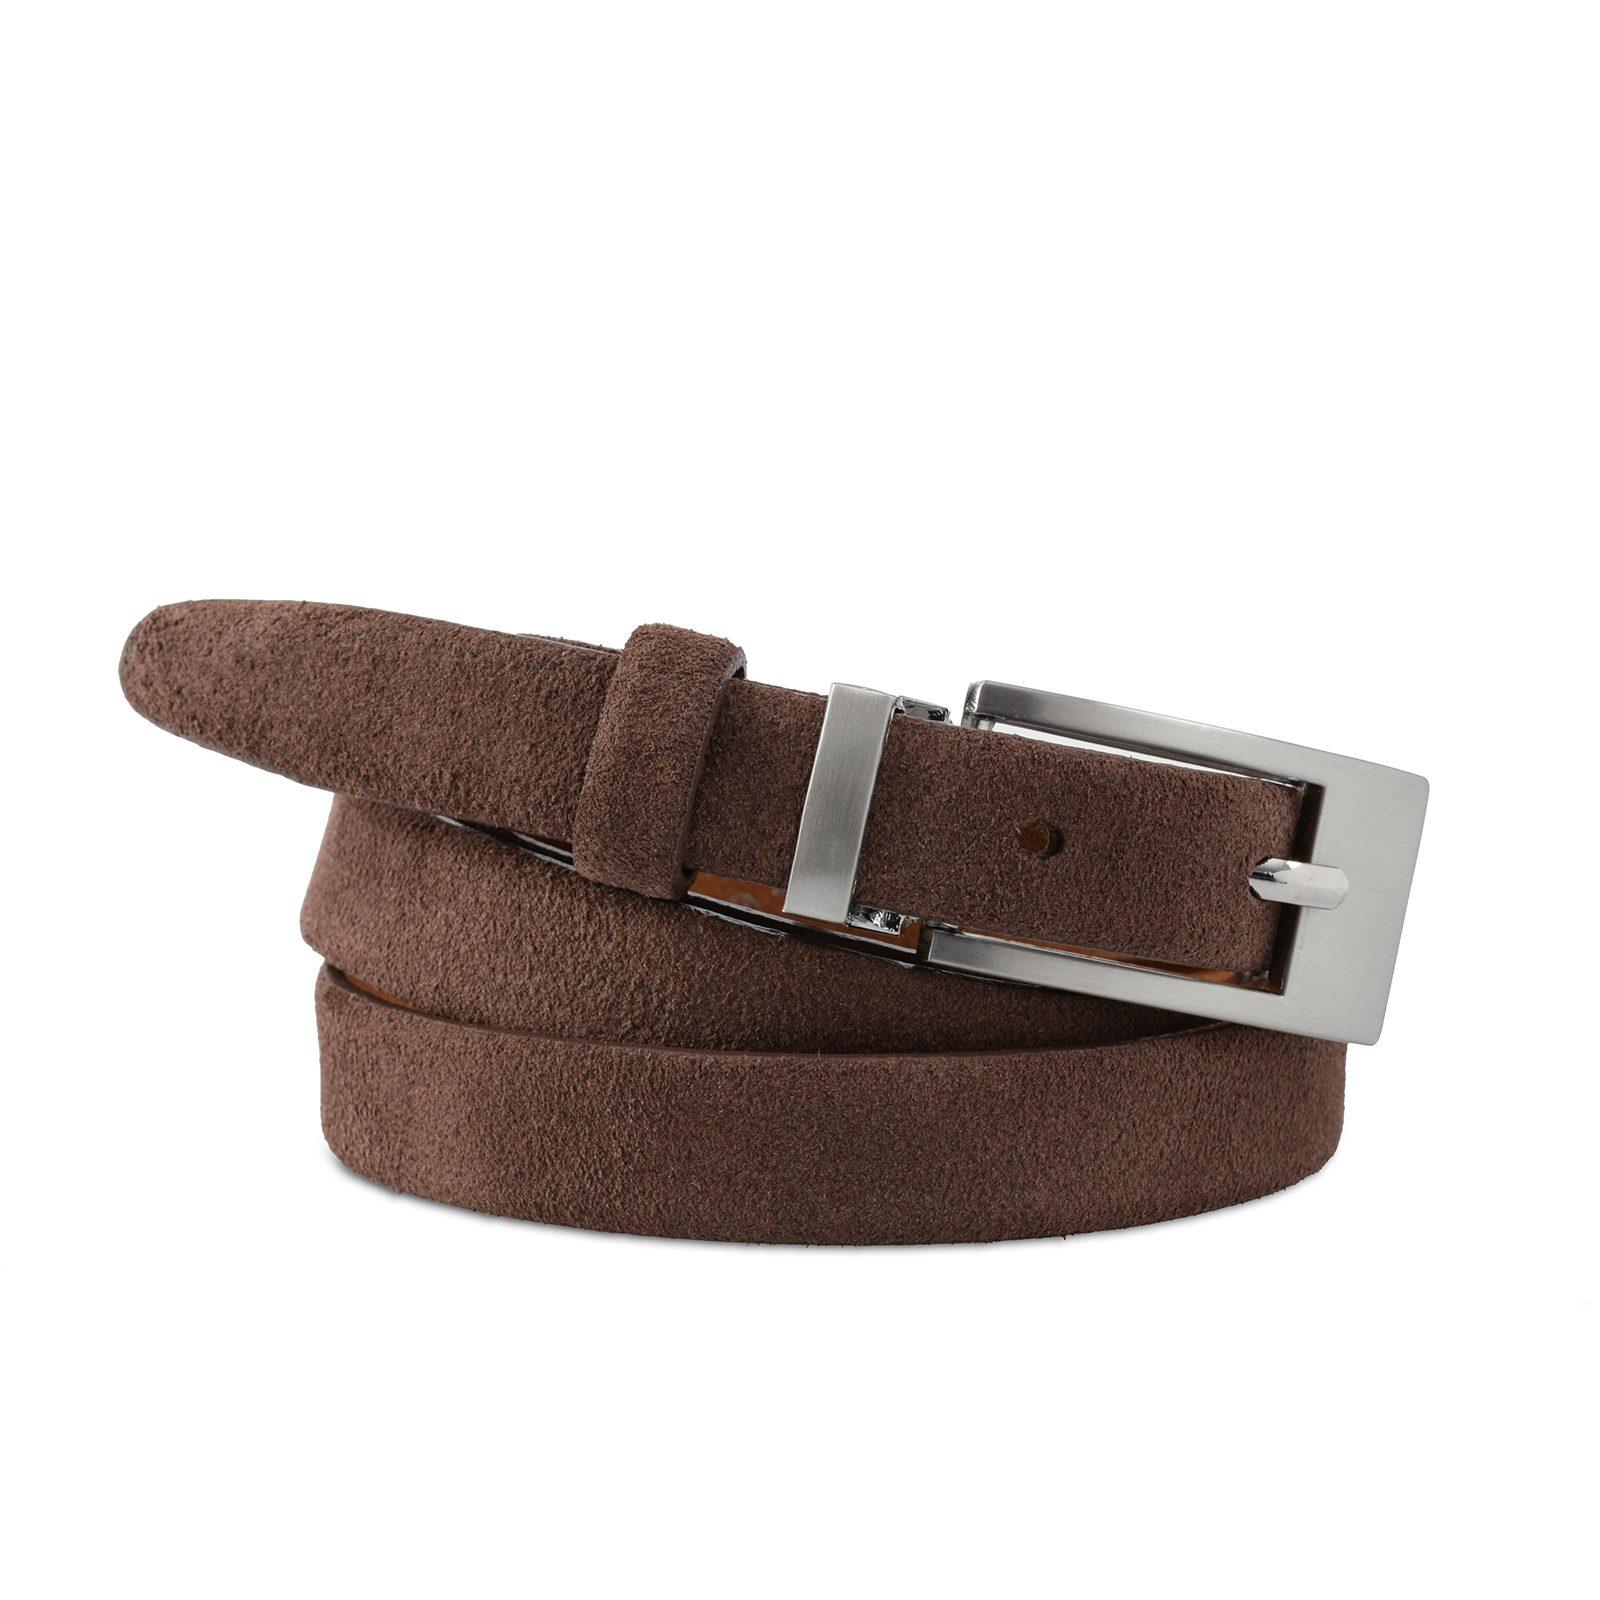 http://lookbook.allee-du-foulard.fr/wp-content/uploads/2018/10/CT-00057-F16-ceinture-femme-en-cuir-marron-1600x1600.jpg